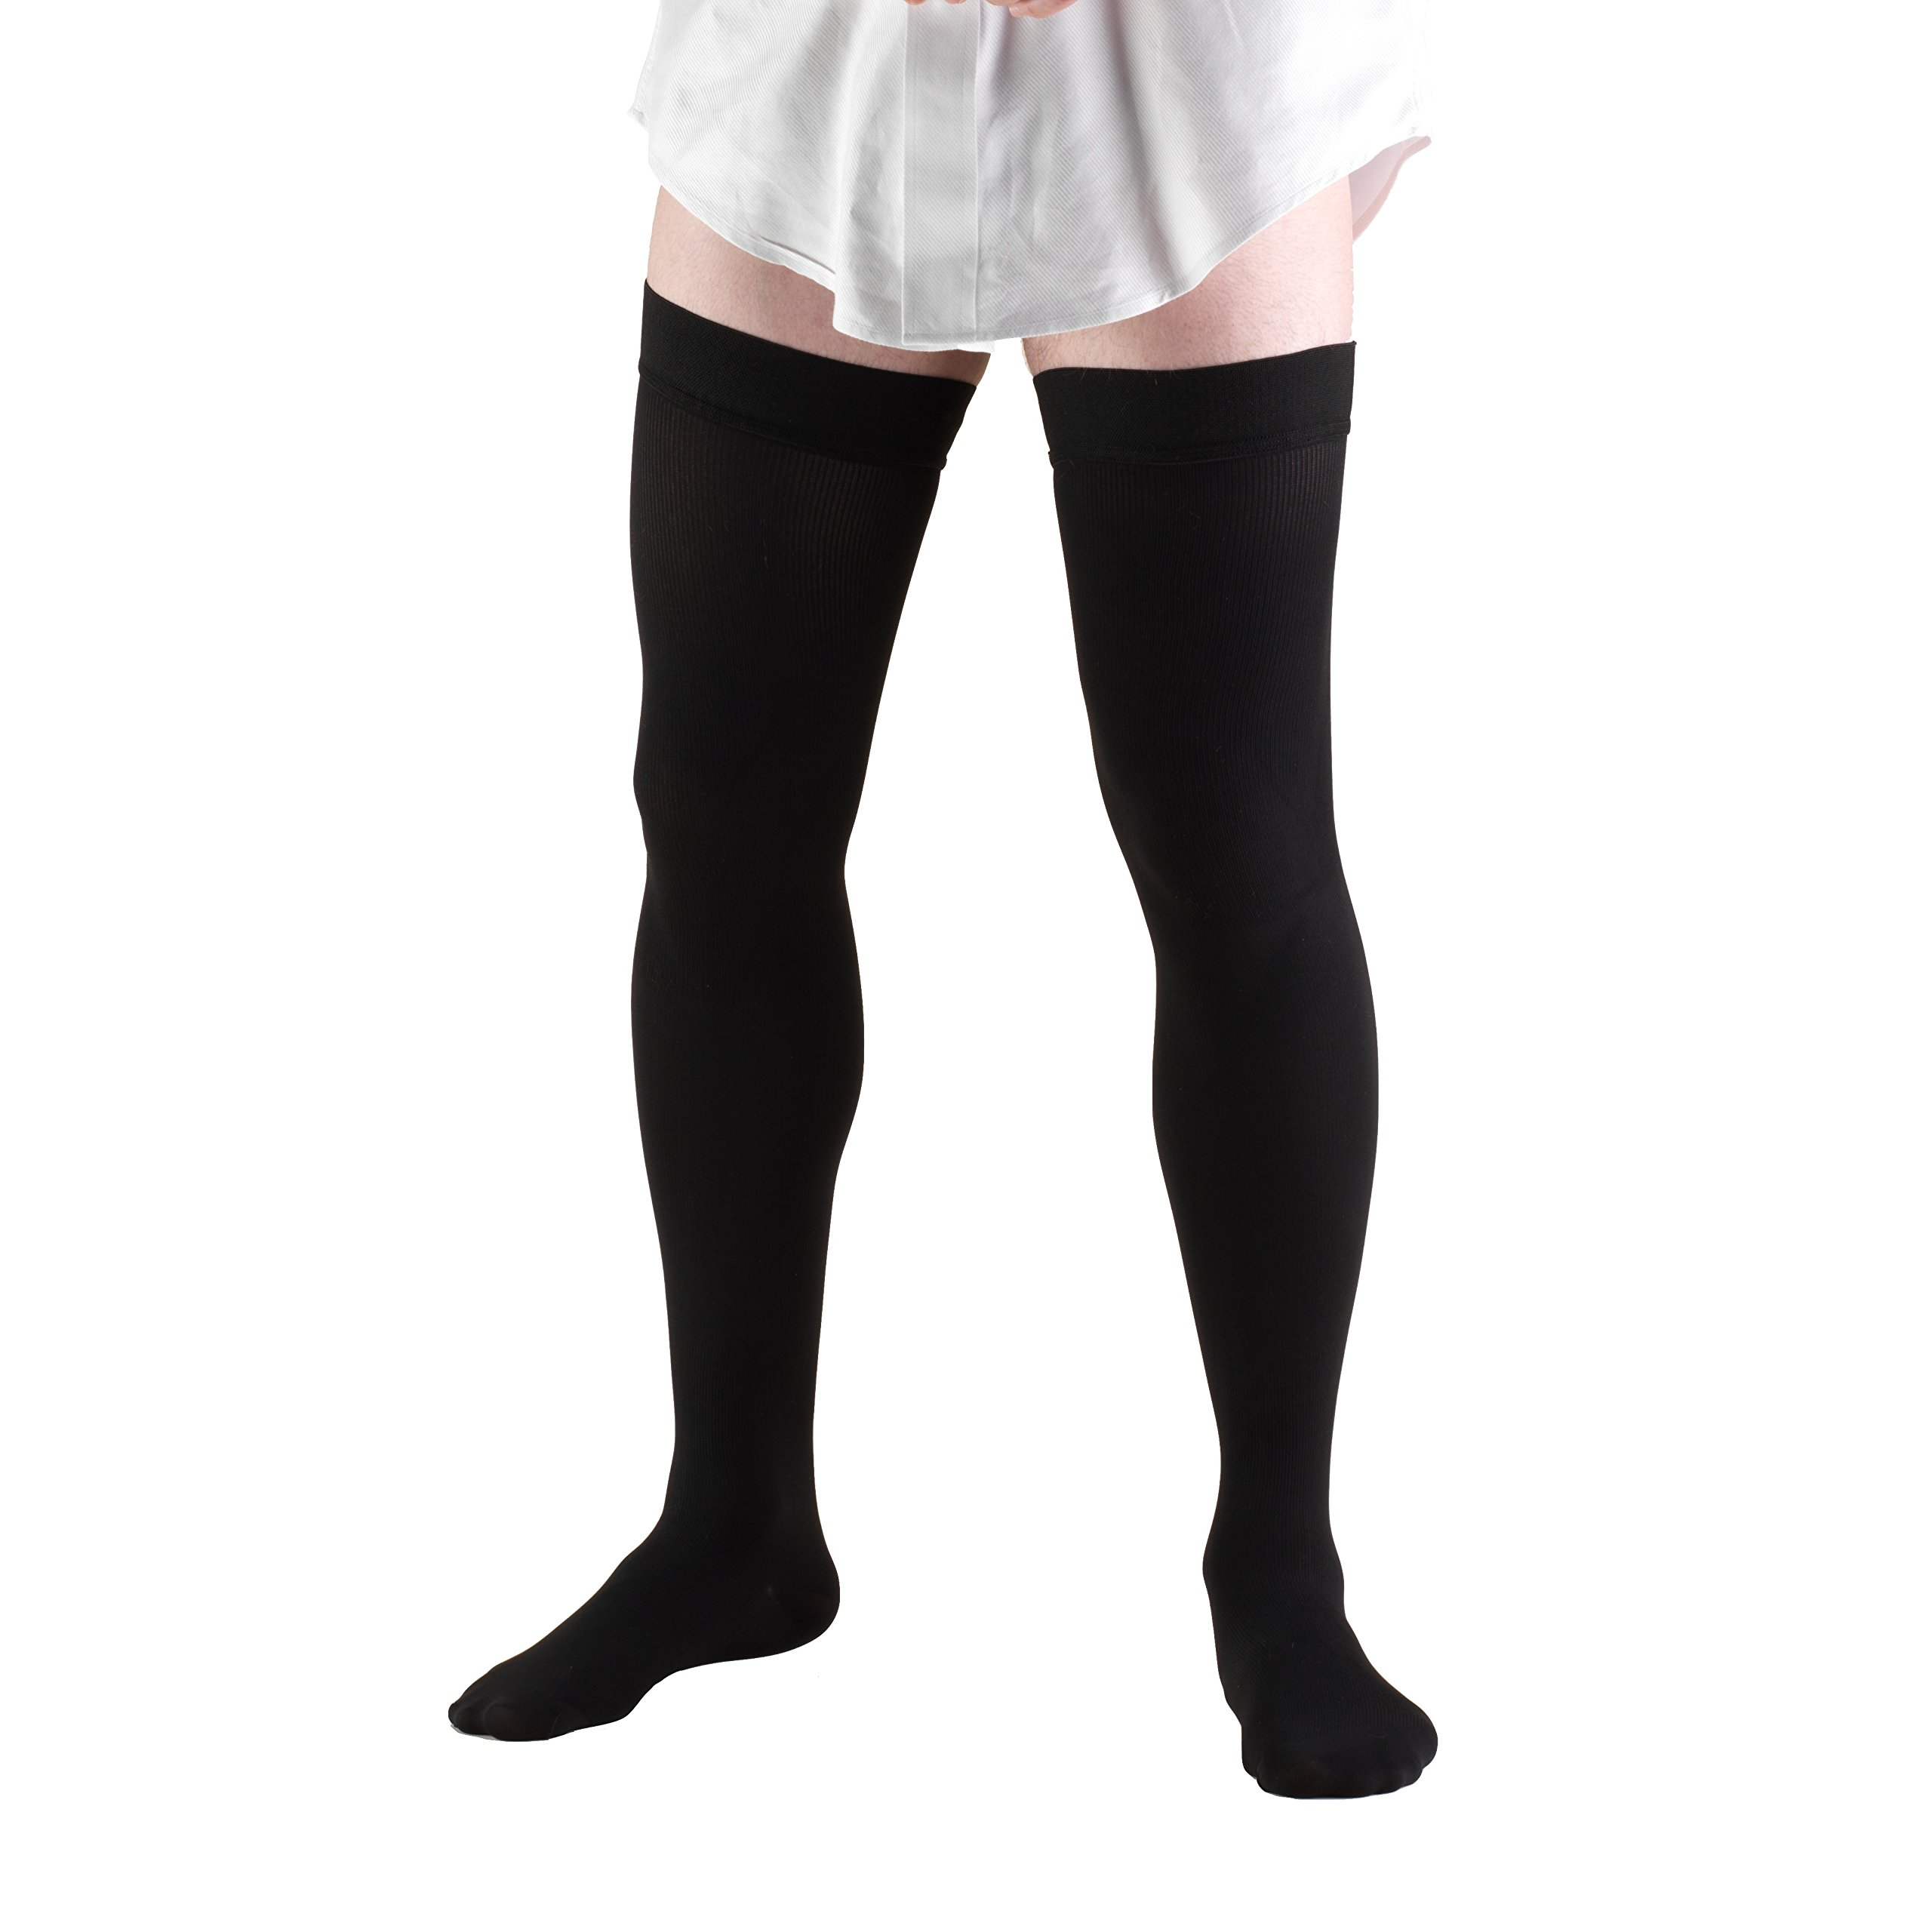 Truform Compression Socks, 20-30 mmHg, Mens Dress Socks, Thigh High Over